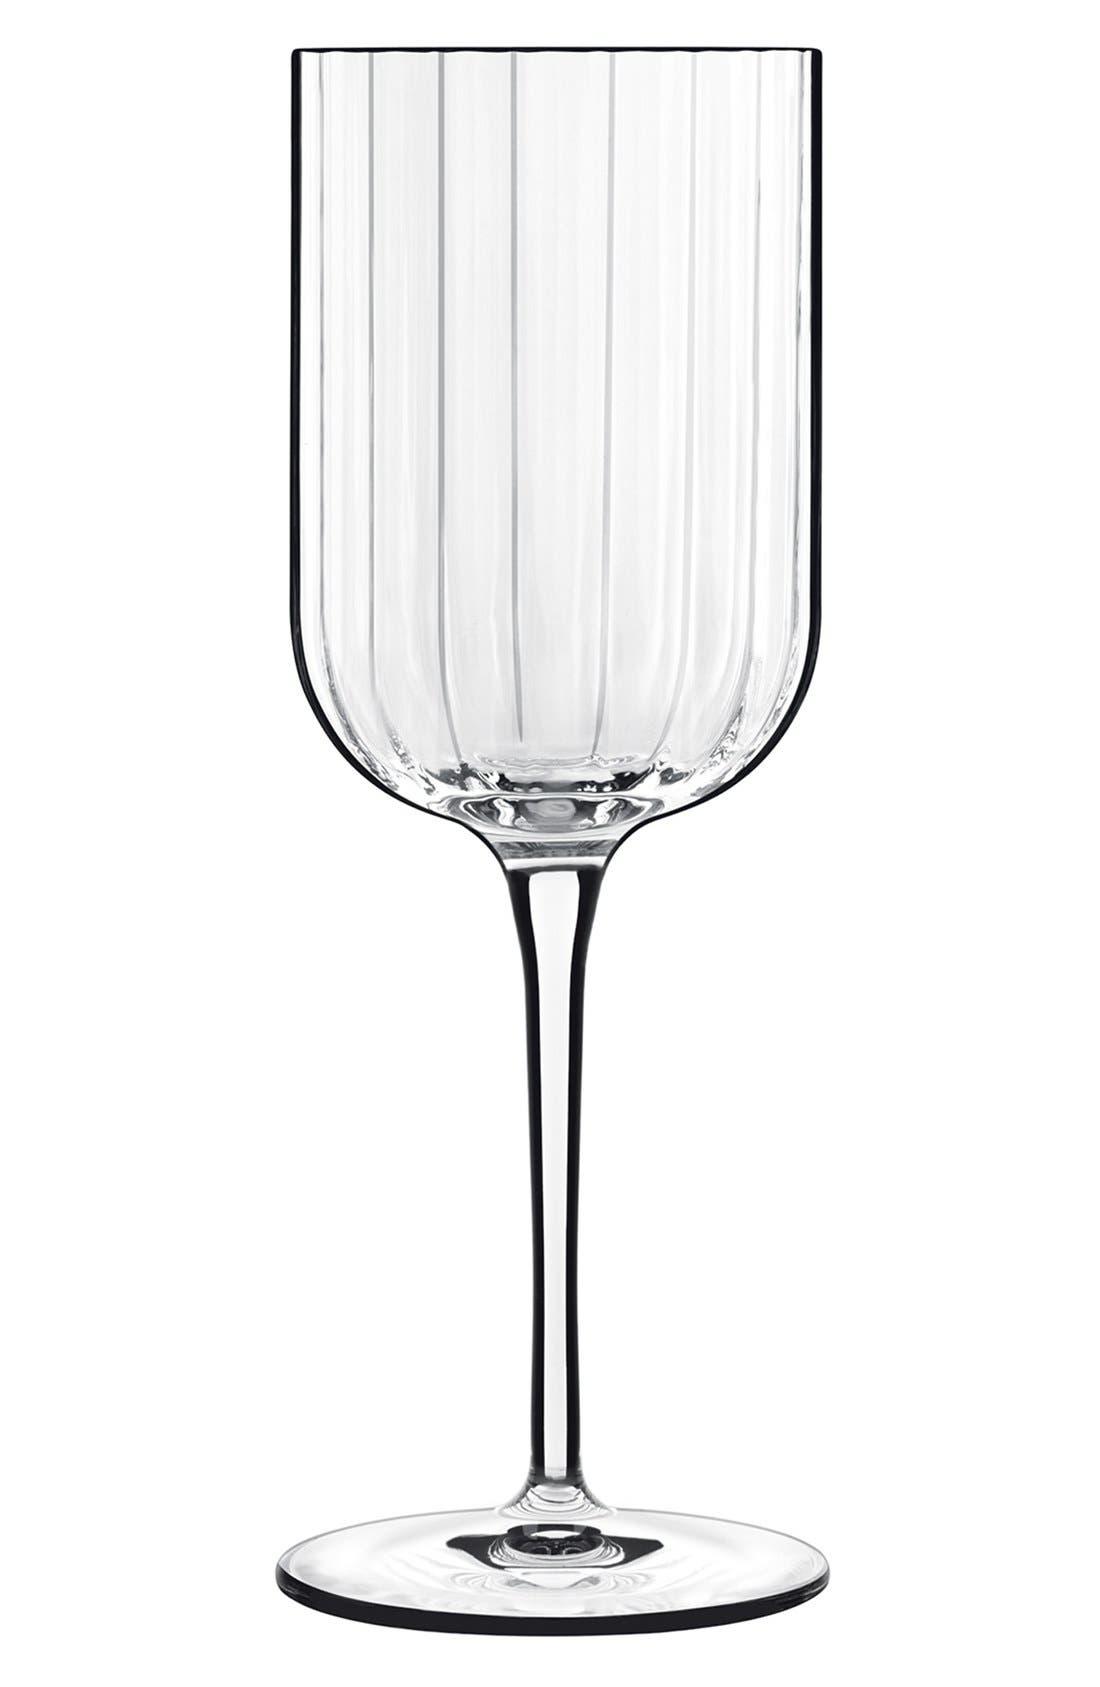 Alternate Image 1 Selected - Luigi Bormioli 'Bach' Red Wine Glasses (Set of 4)